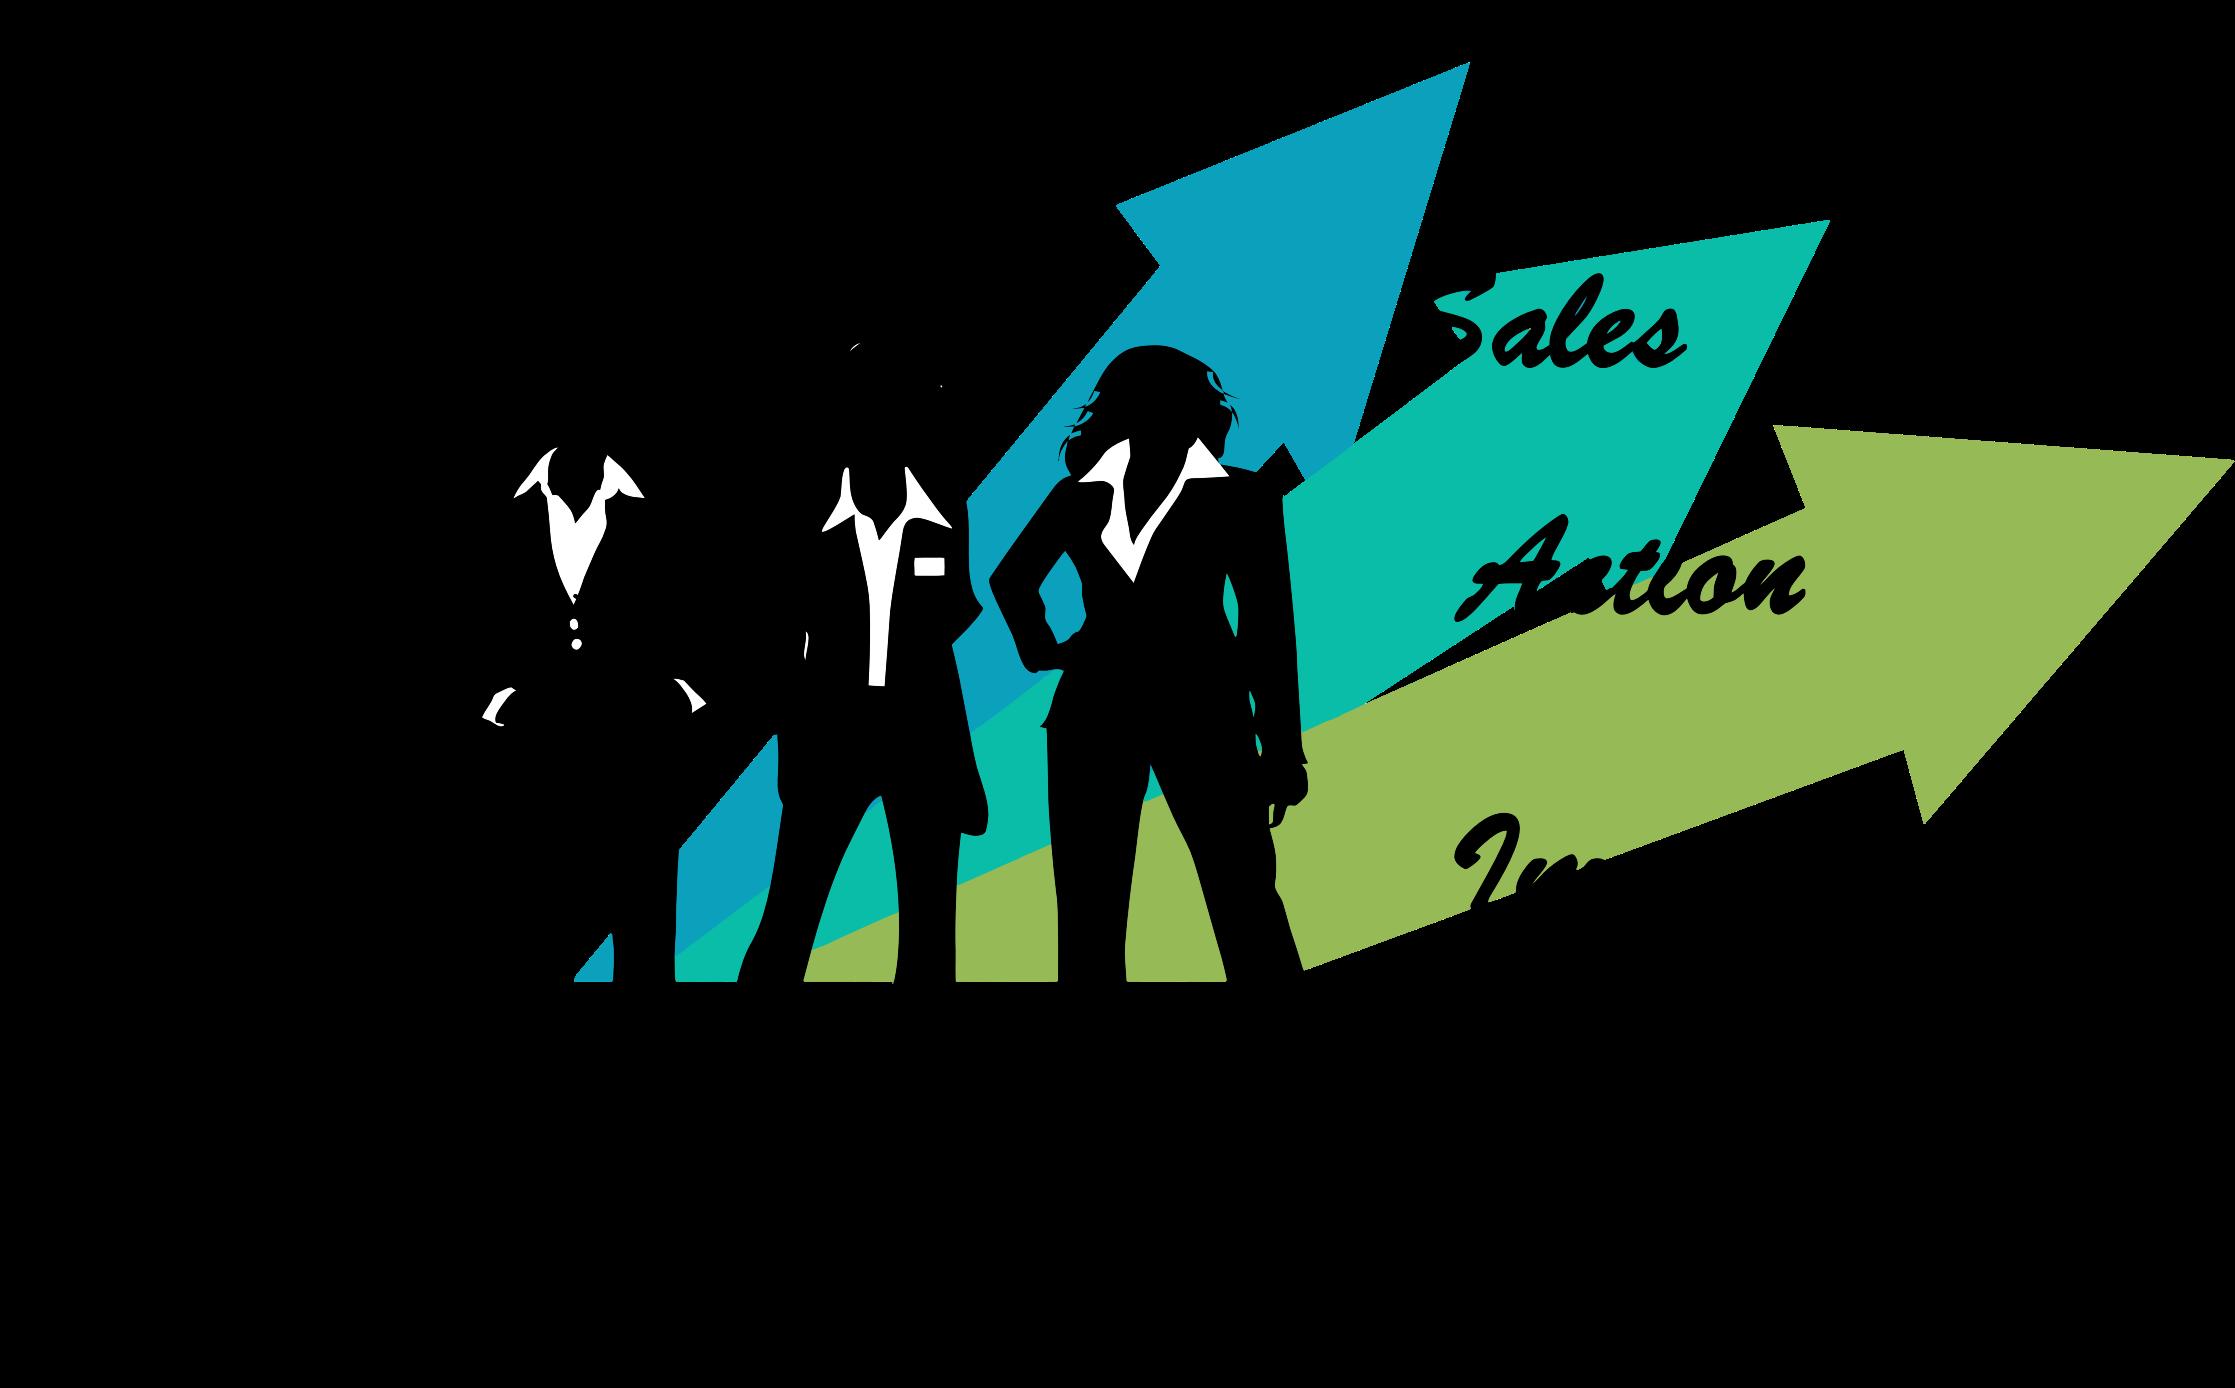 Motivation clipart profit. Female business executives icons